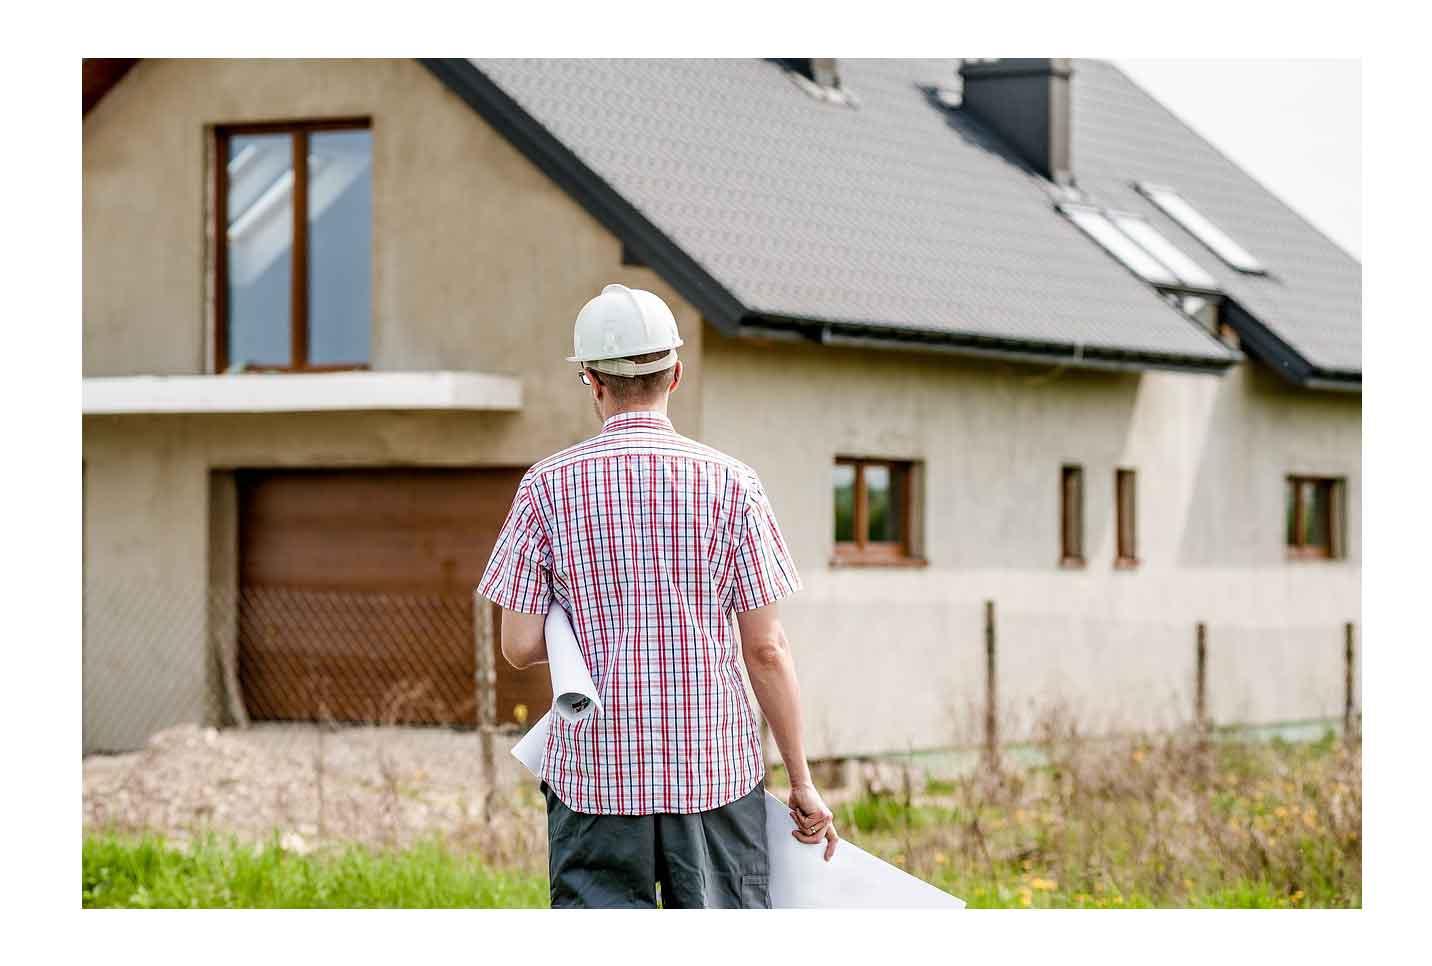 Construction Hard Money Loans Investment